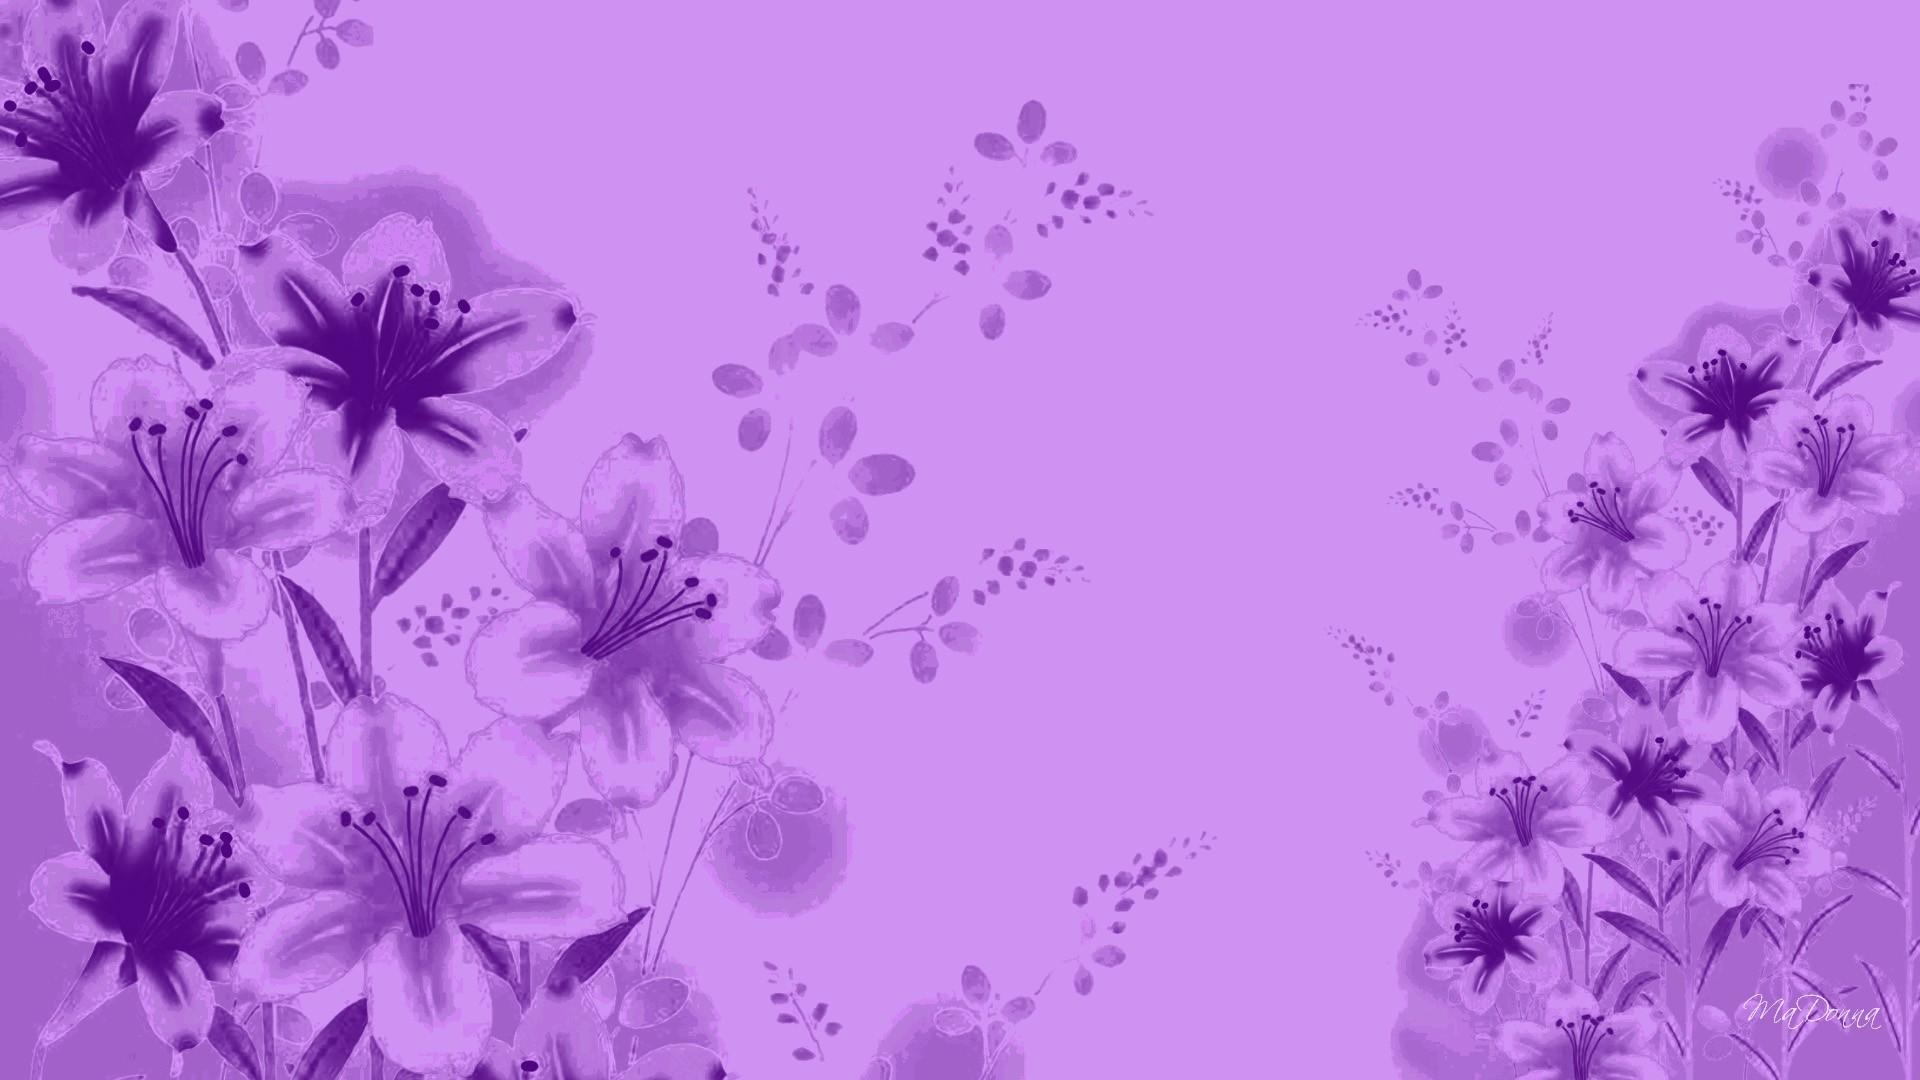 Lavender Colour Wallpaper – Wallpaper, High Definition, High Quality .